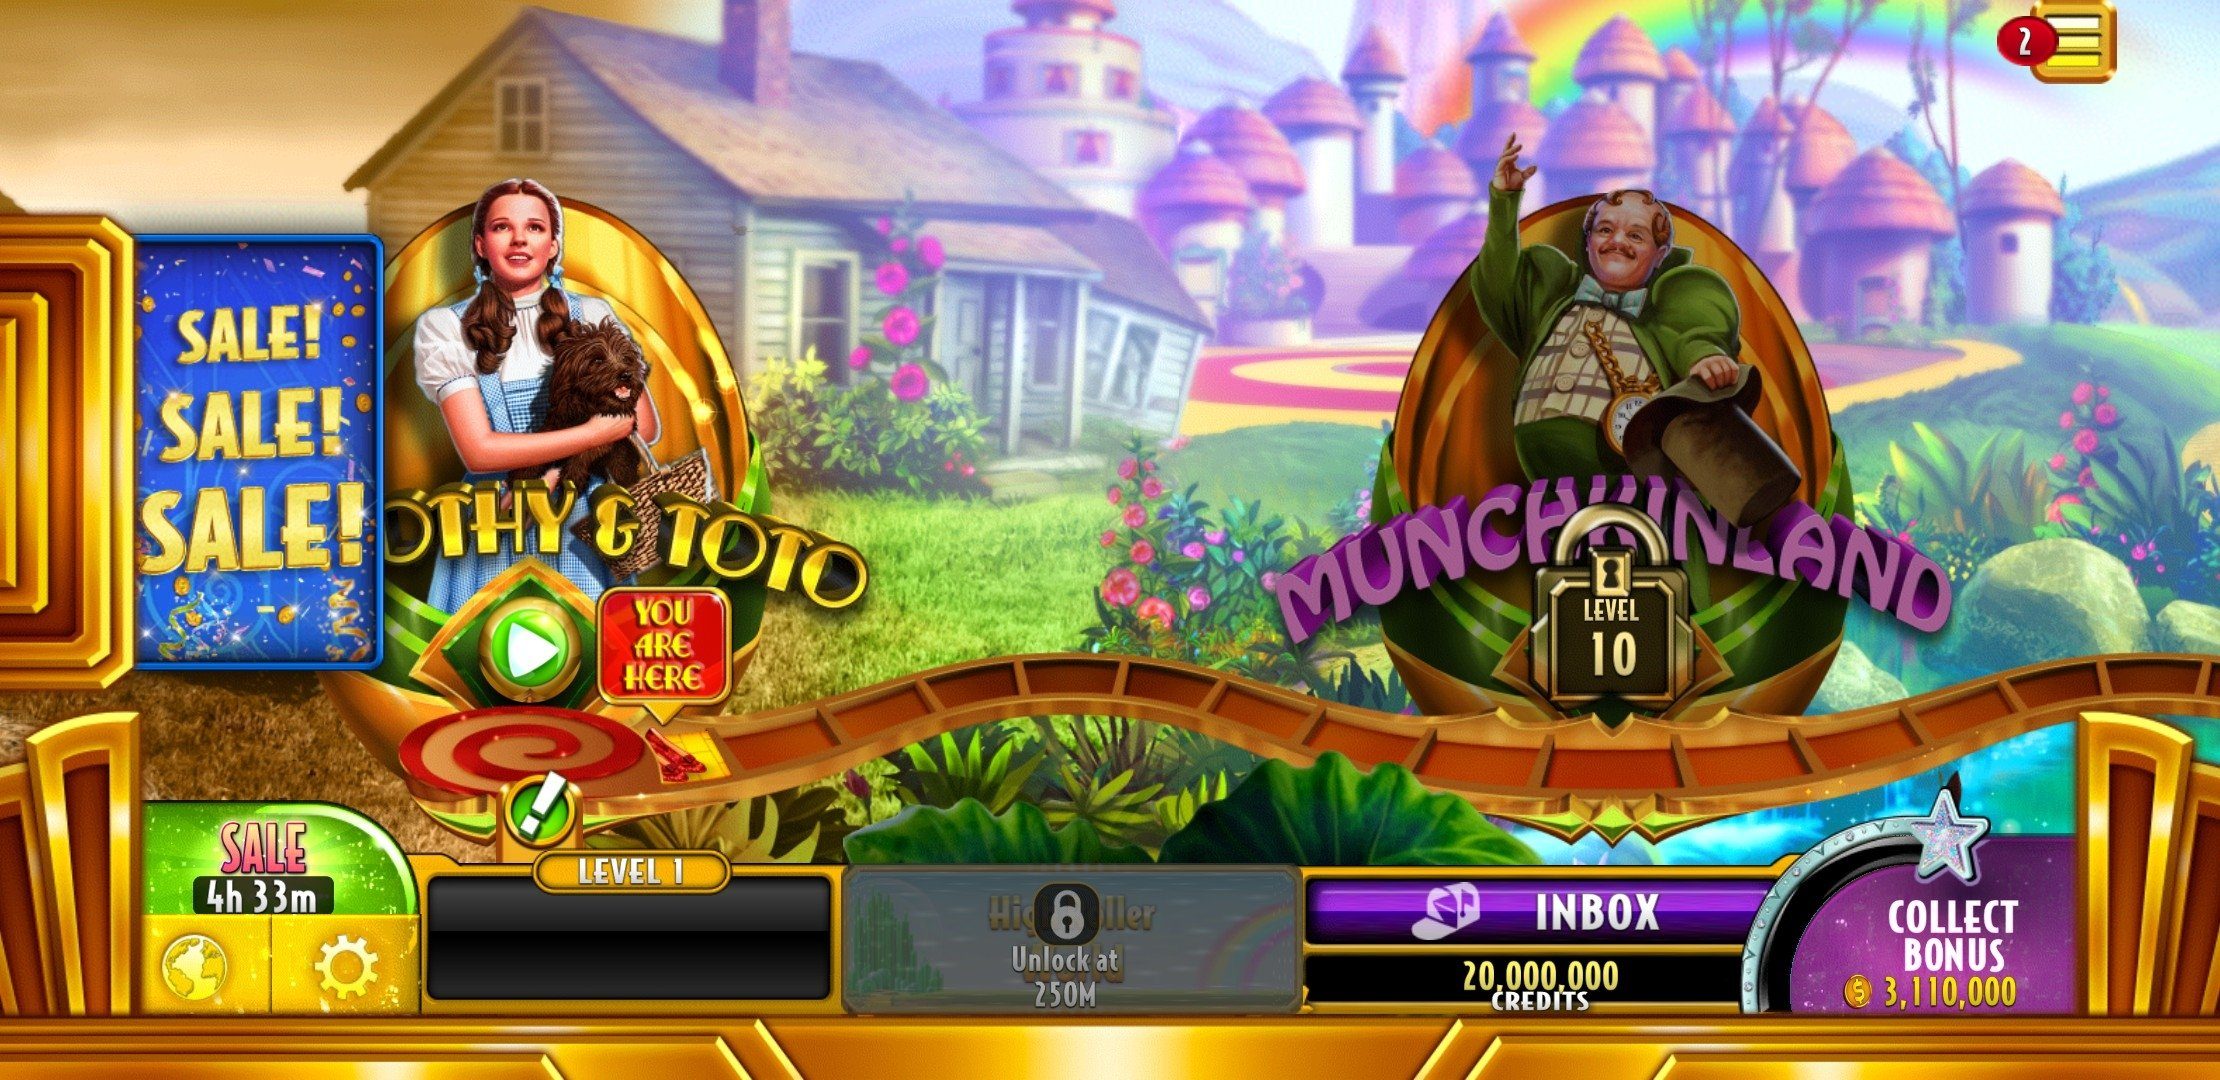 gioca alle slot machine King Kong